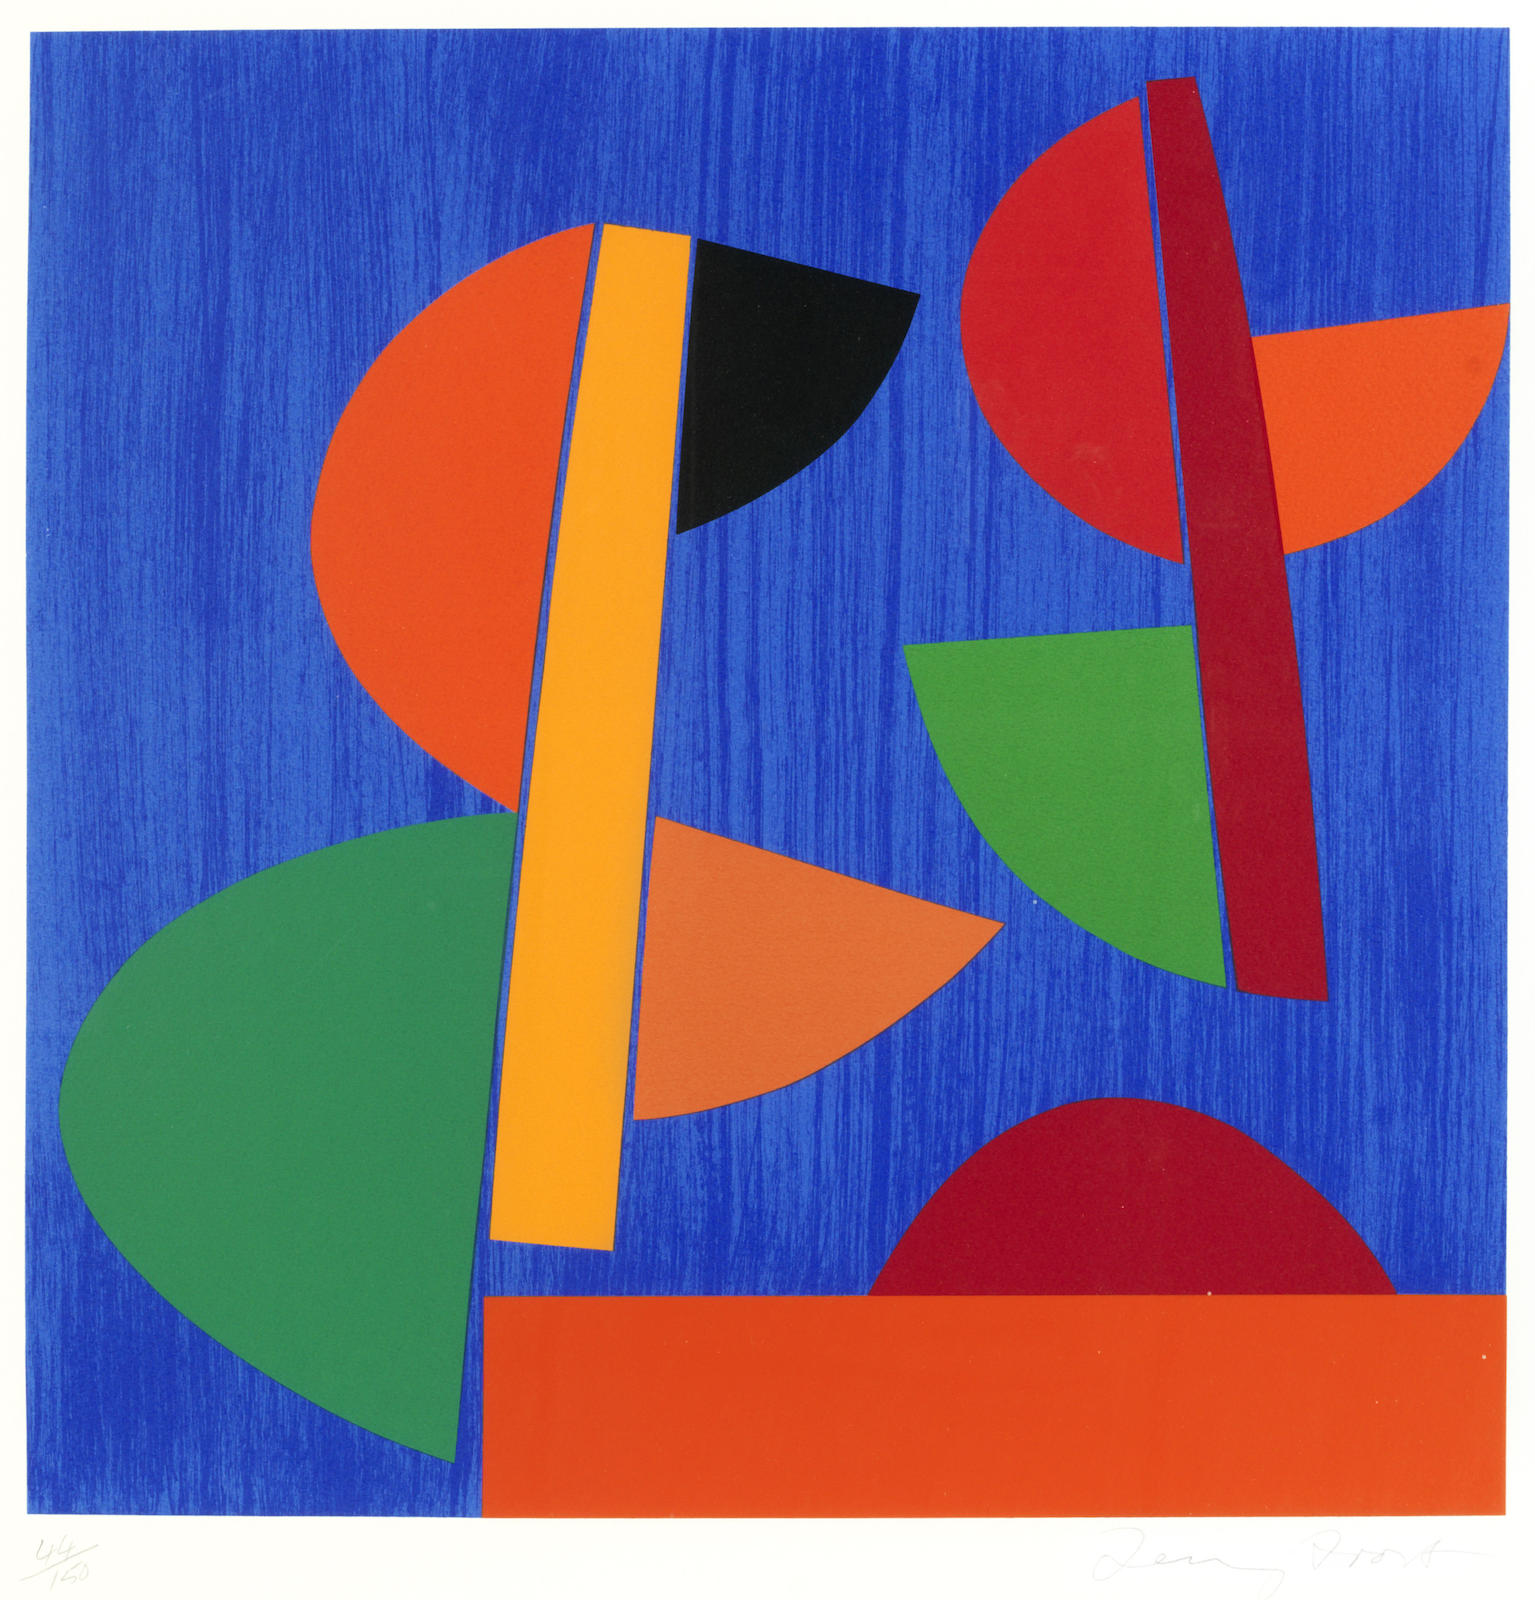 Terry Frost-Swing Red Newlyn (Kemp 183)-1998